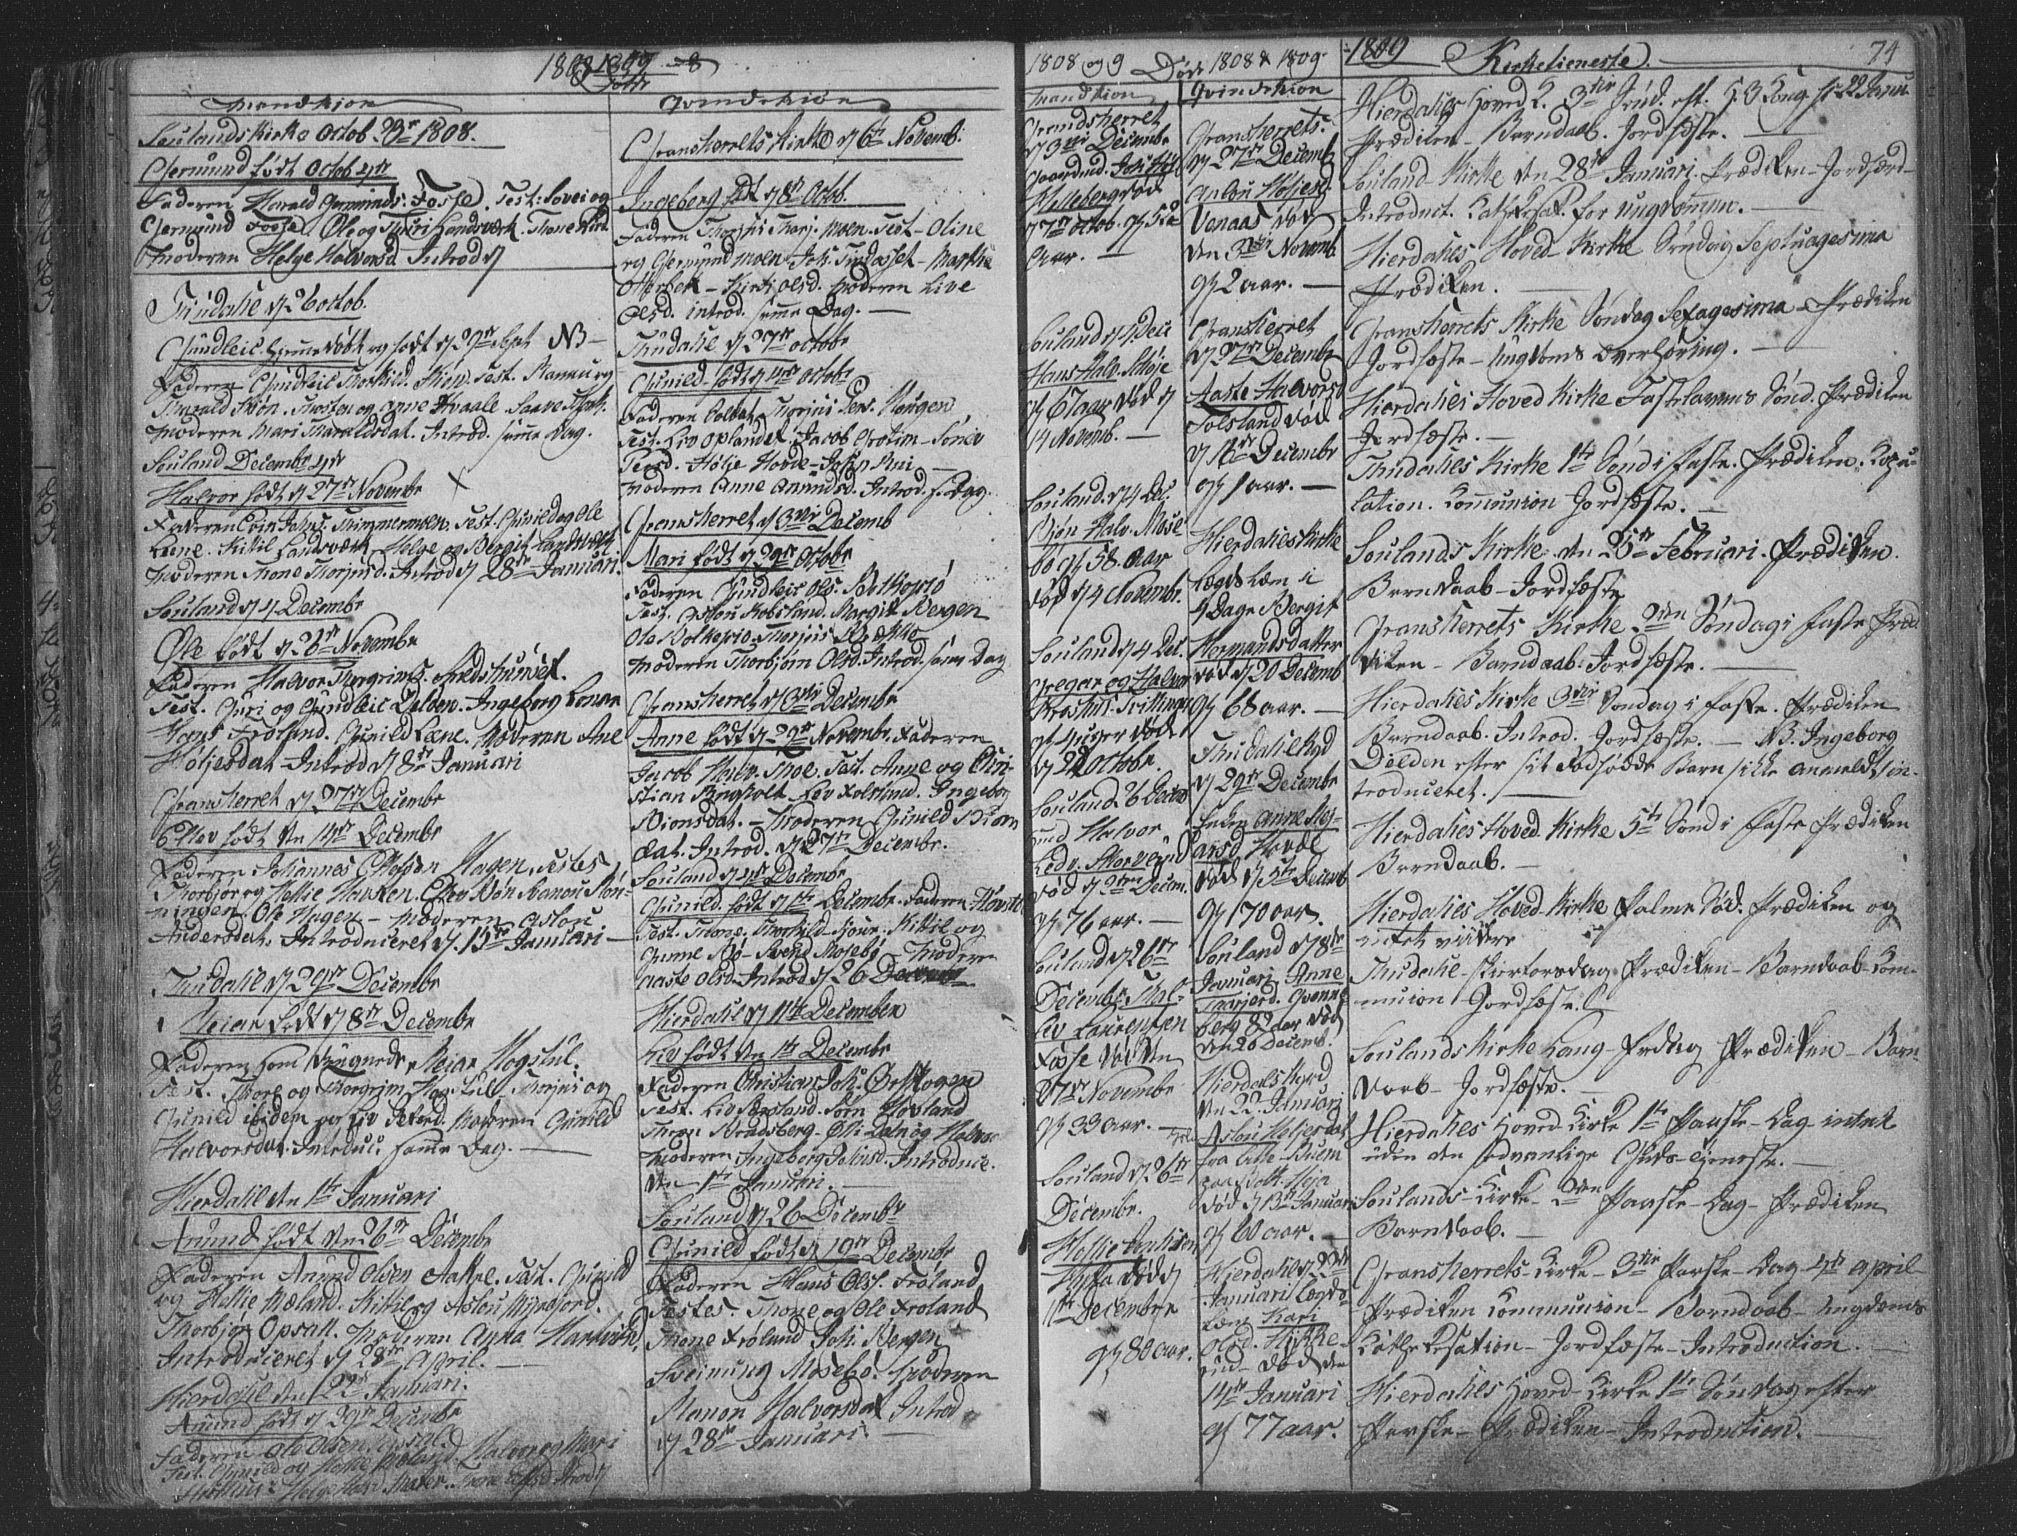 SAKO, Hjartdal kirkebøker, F/Fa/L0006: Ministerialbok nr. I 6, 1801-1814, s. 74